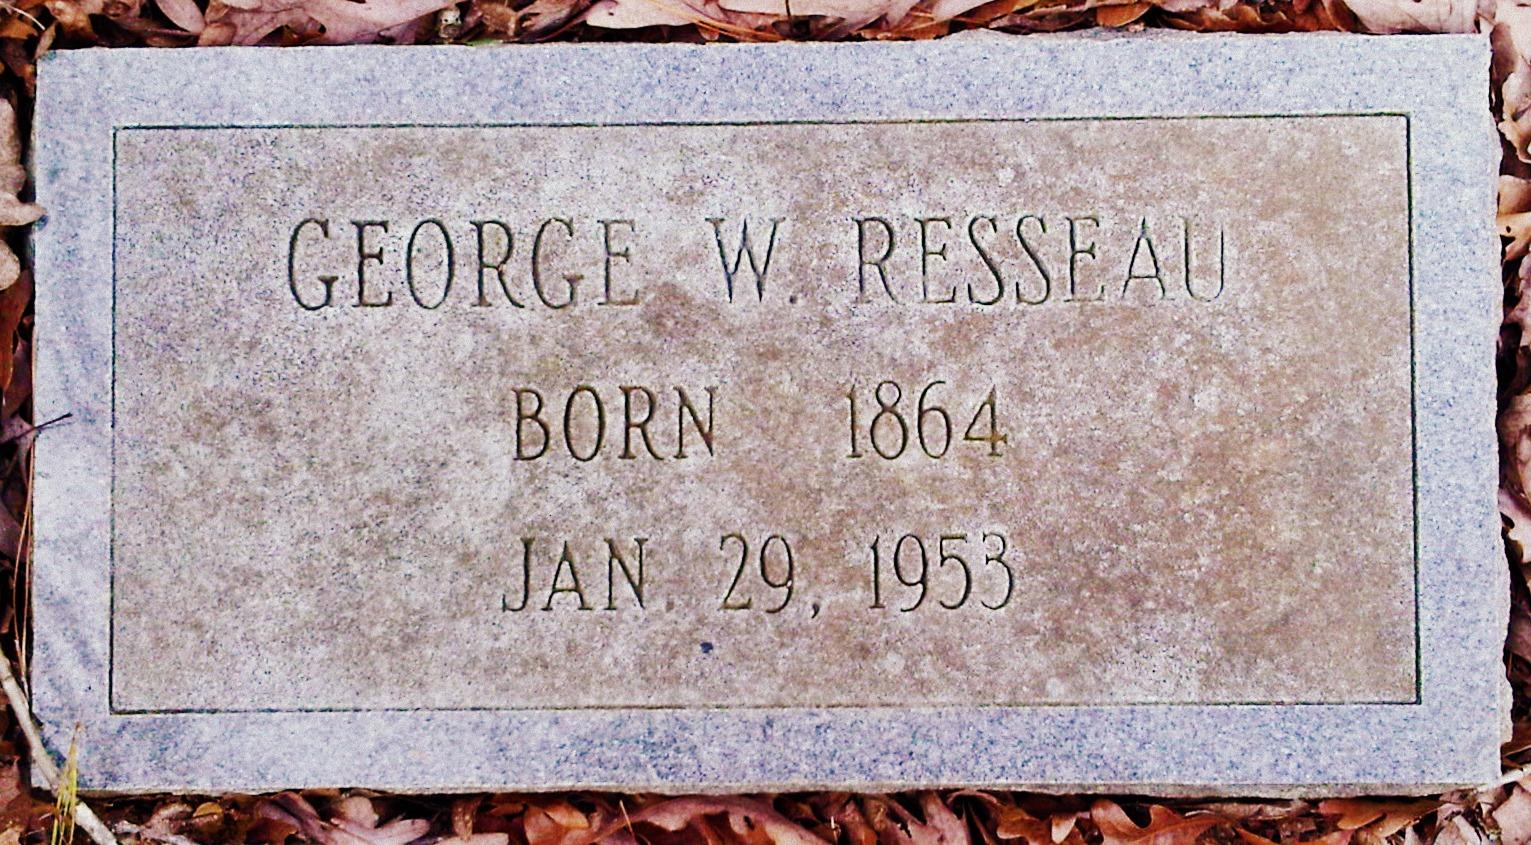 George W Resseau